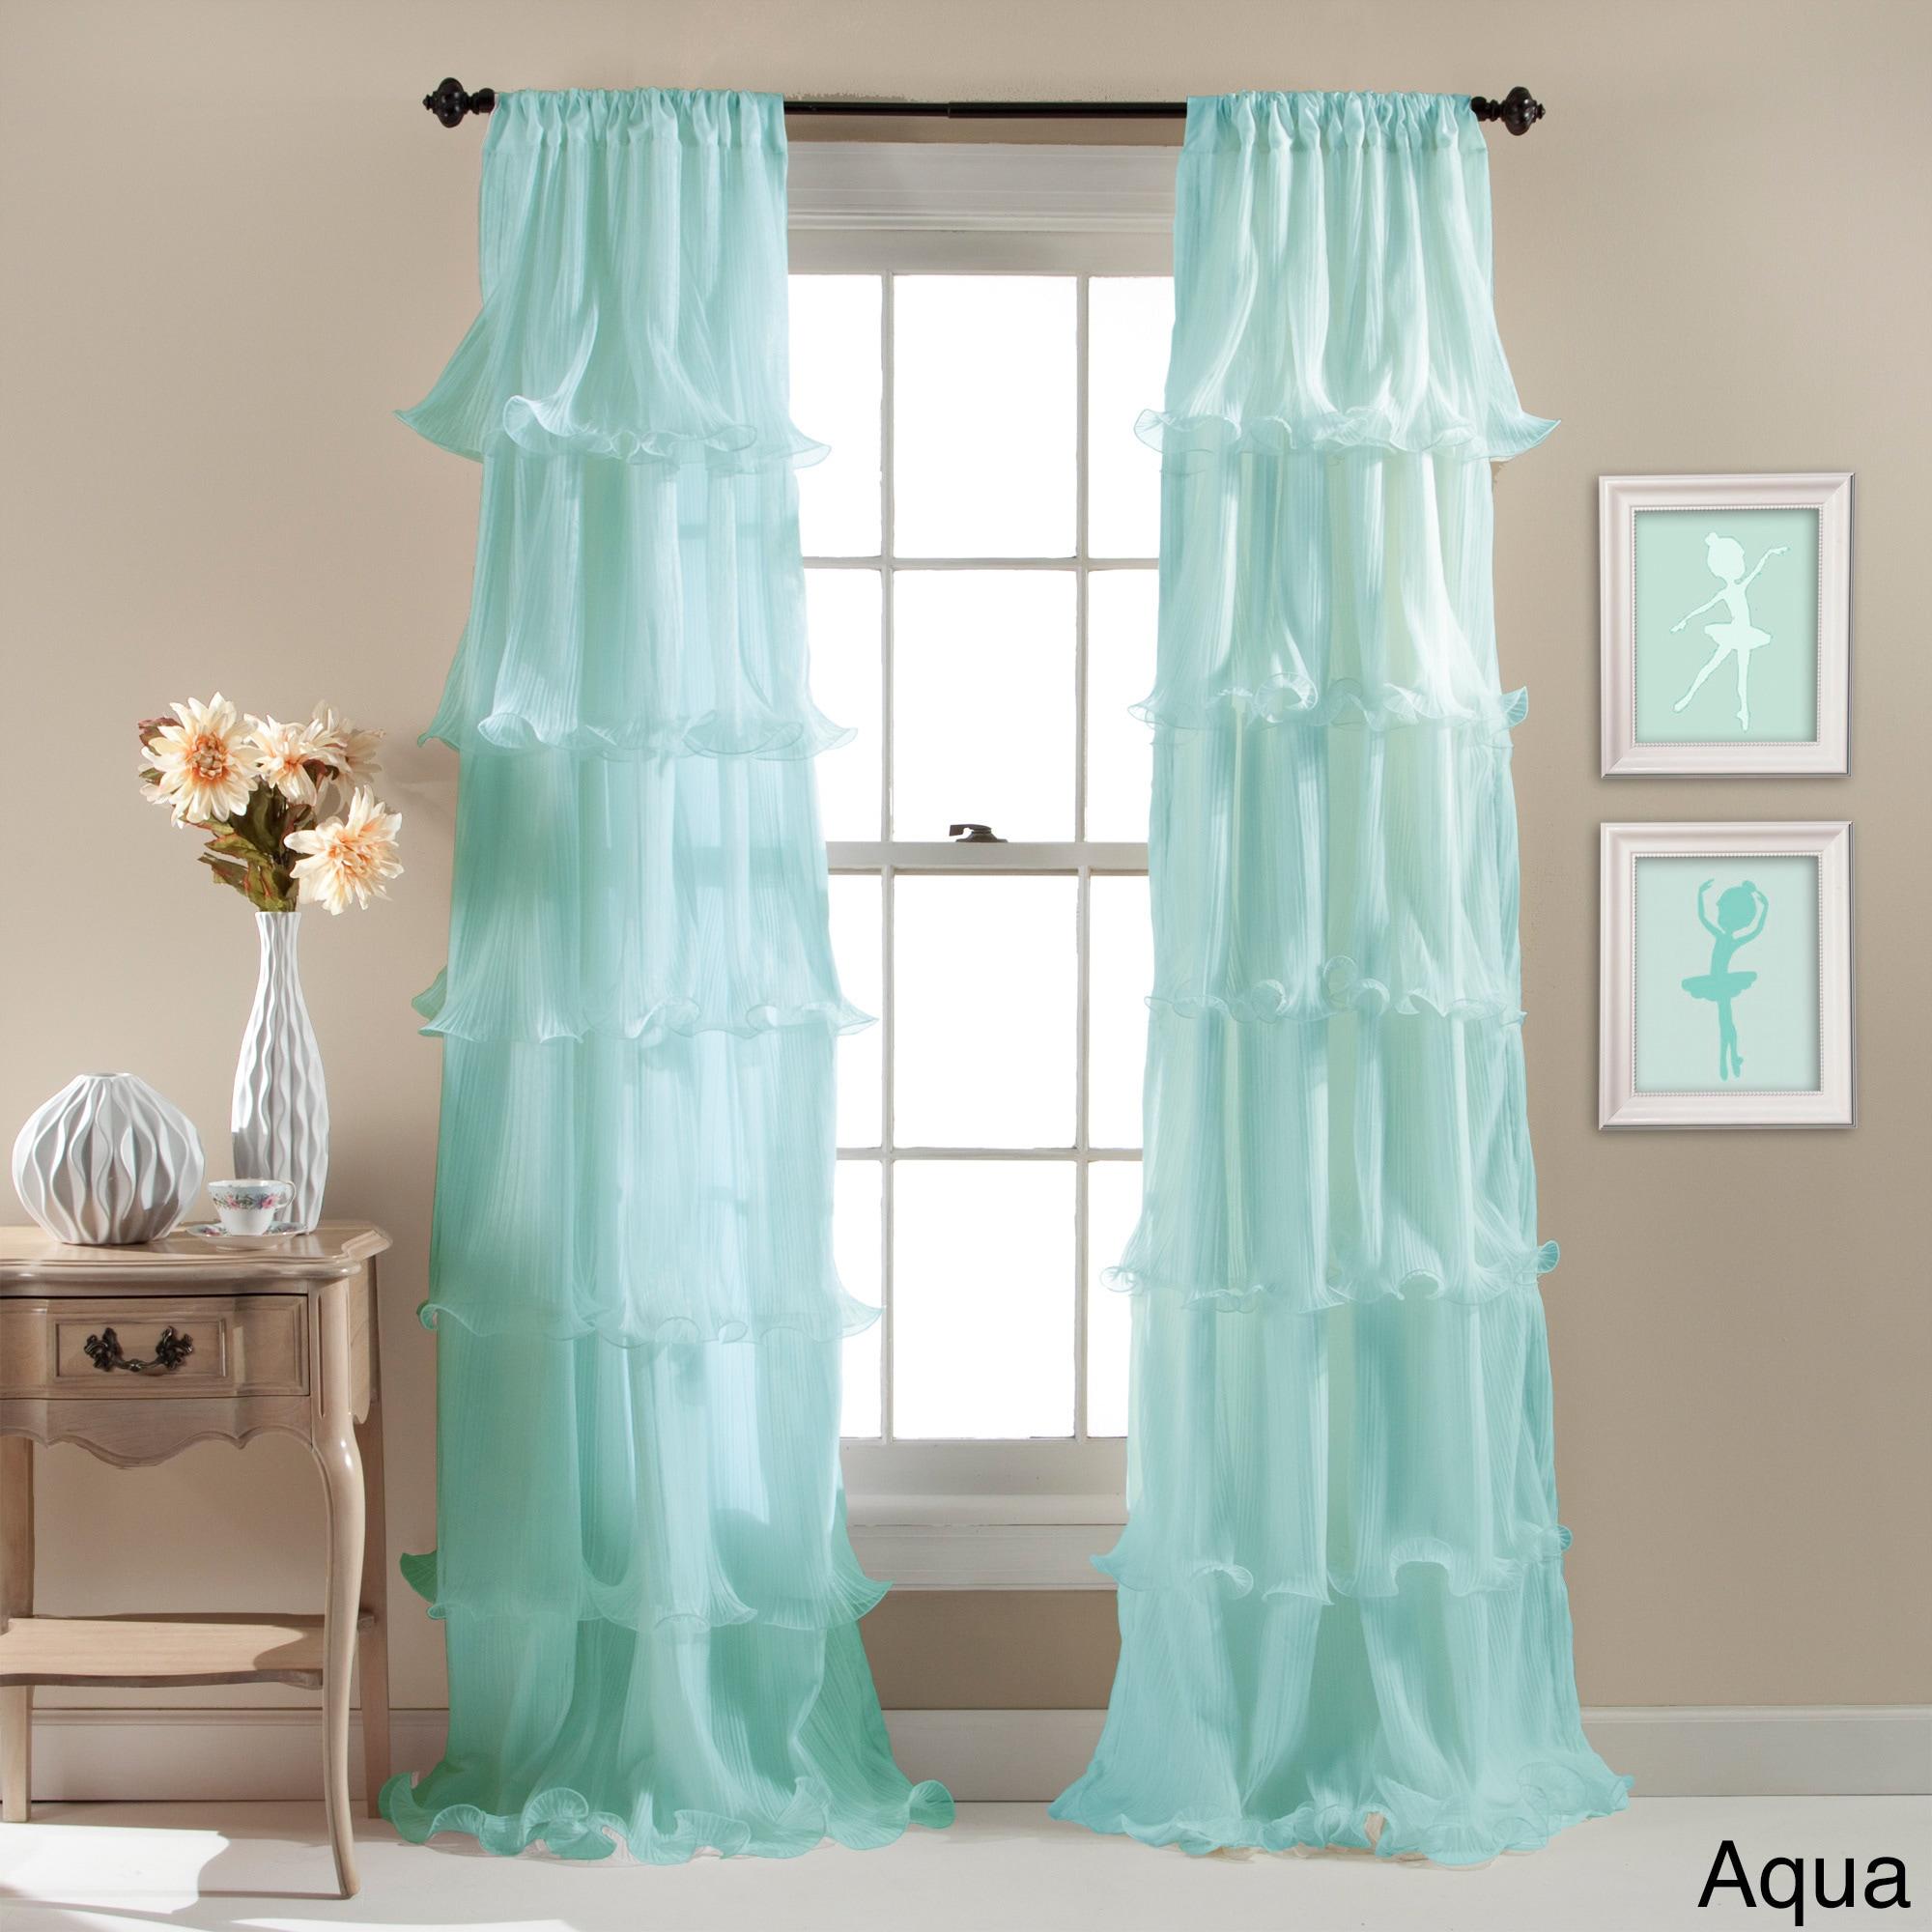 fashions curtain cream panel ruffle ruffled curtains lorraine view home sheer gypsy